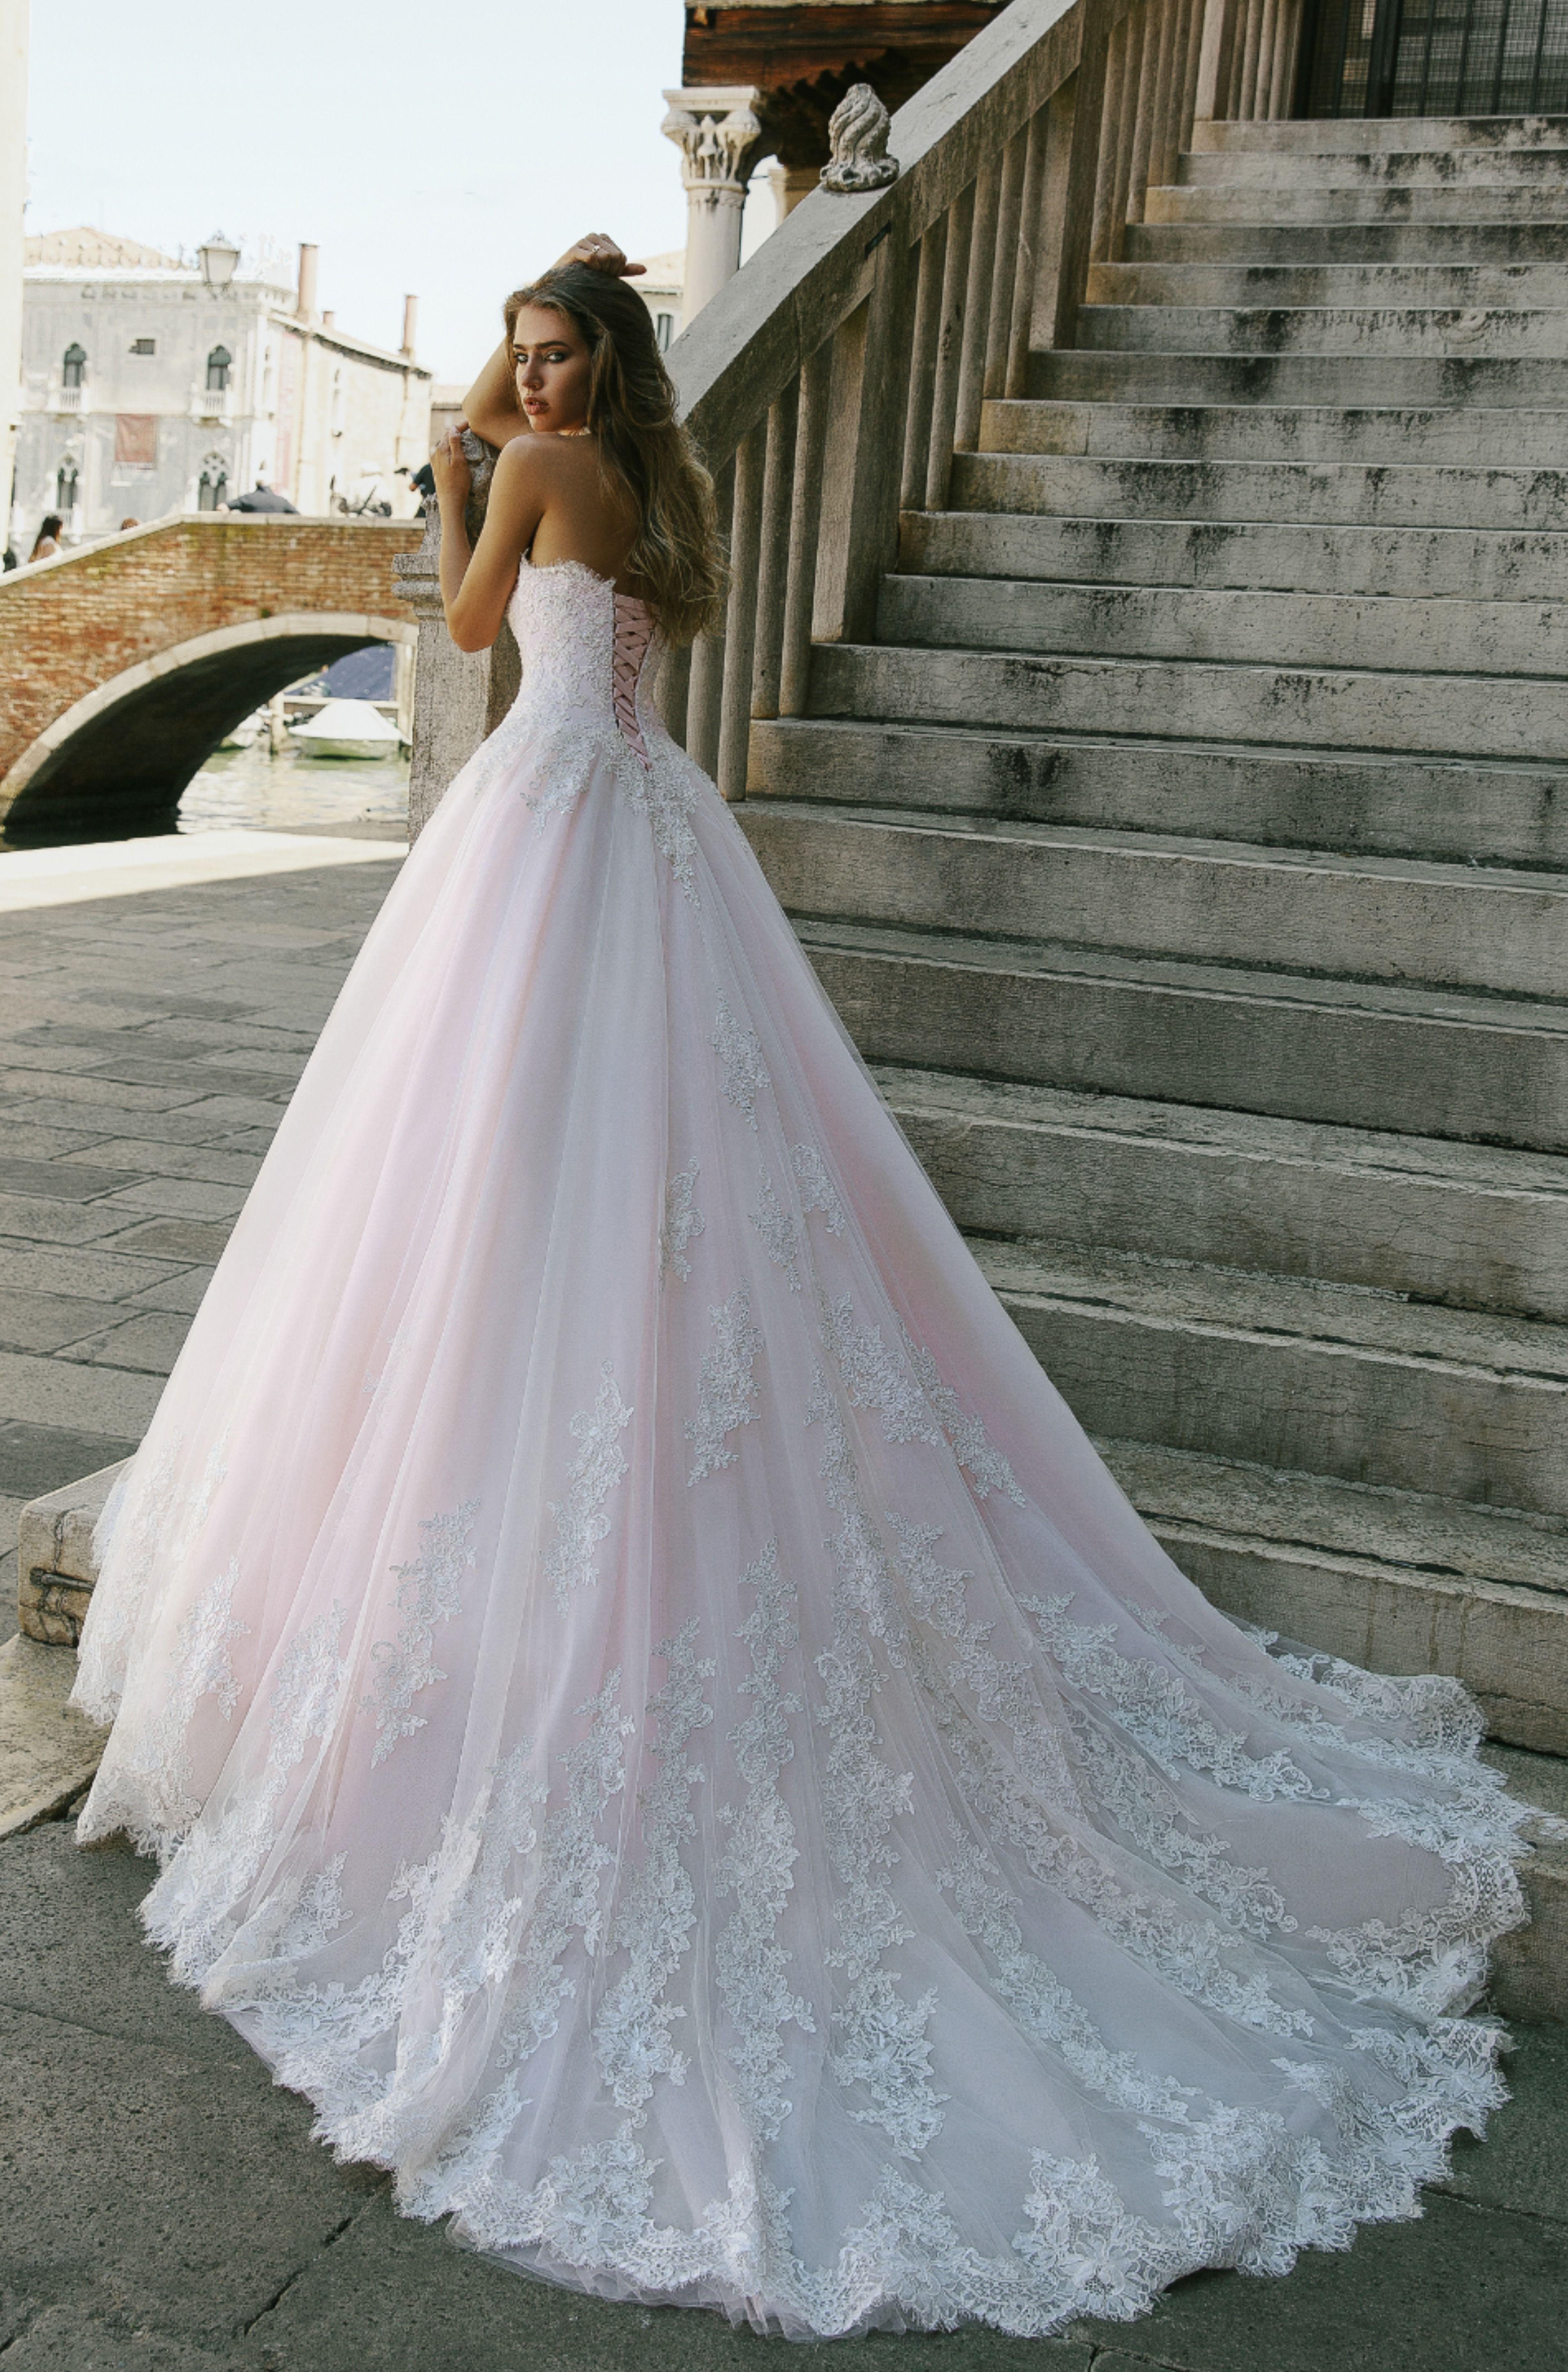 Holly Wedding Dress Italian Romance Collection Long Train Wedding Dress Italian Wedding Dresses Big Wedding Dresses [ 5809 x 3840 Pixel ]